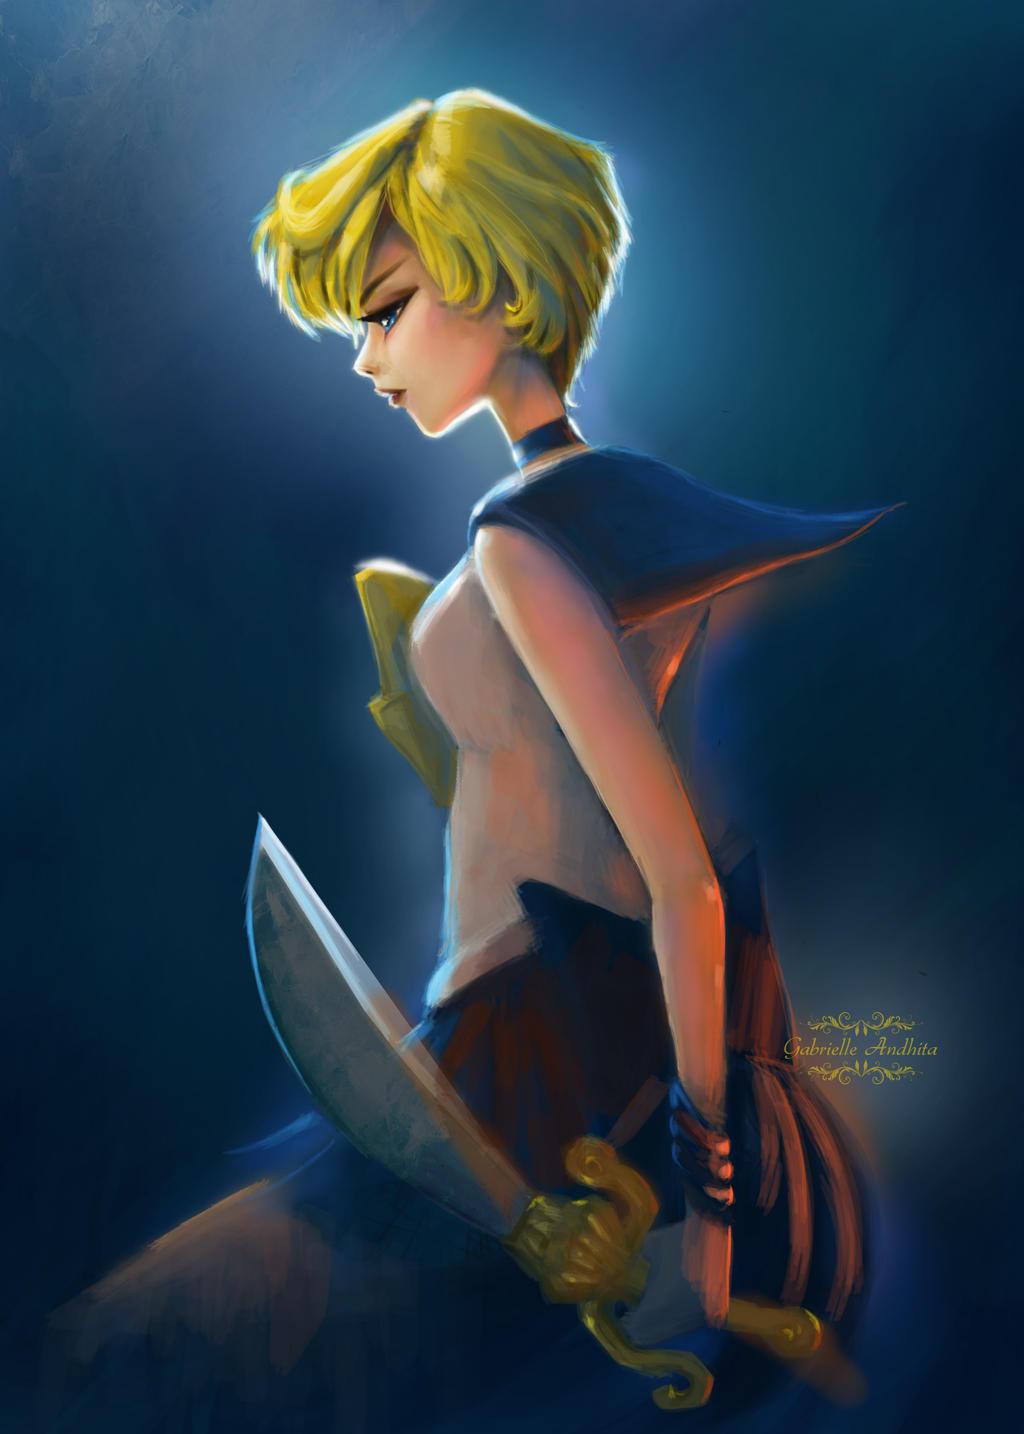 Sailor Uranus by gabrielleandhita